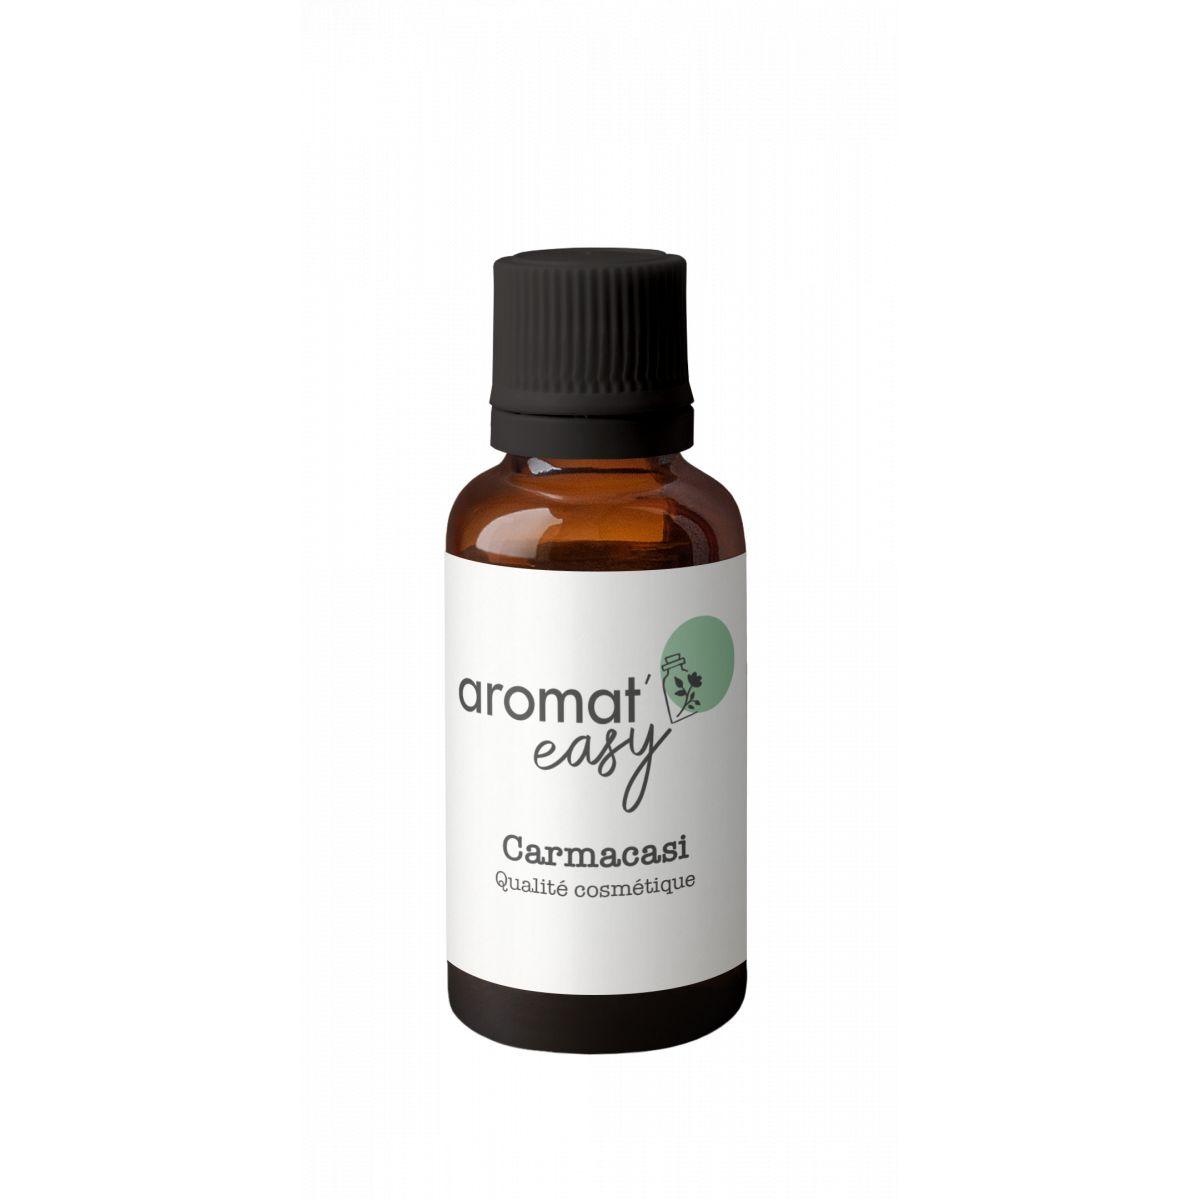 Fragrance Carmacasi